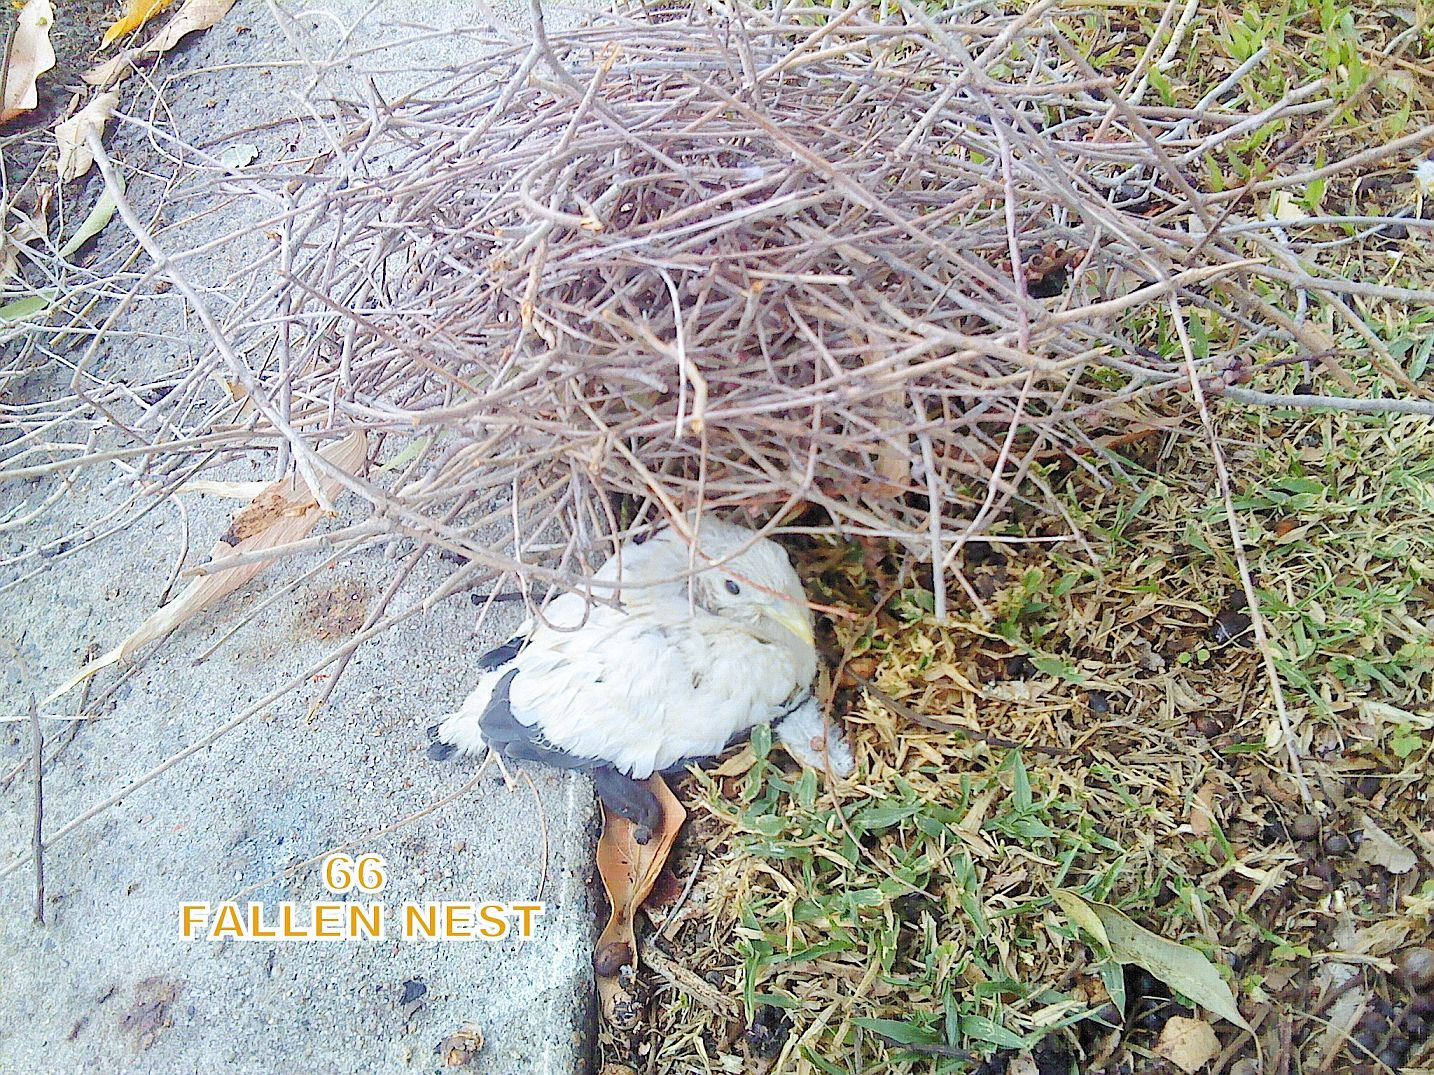 66 chick_fallen_nest_BV_m